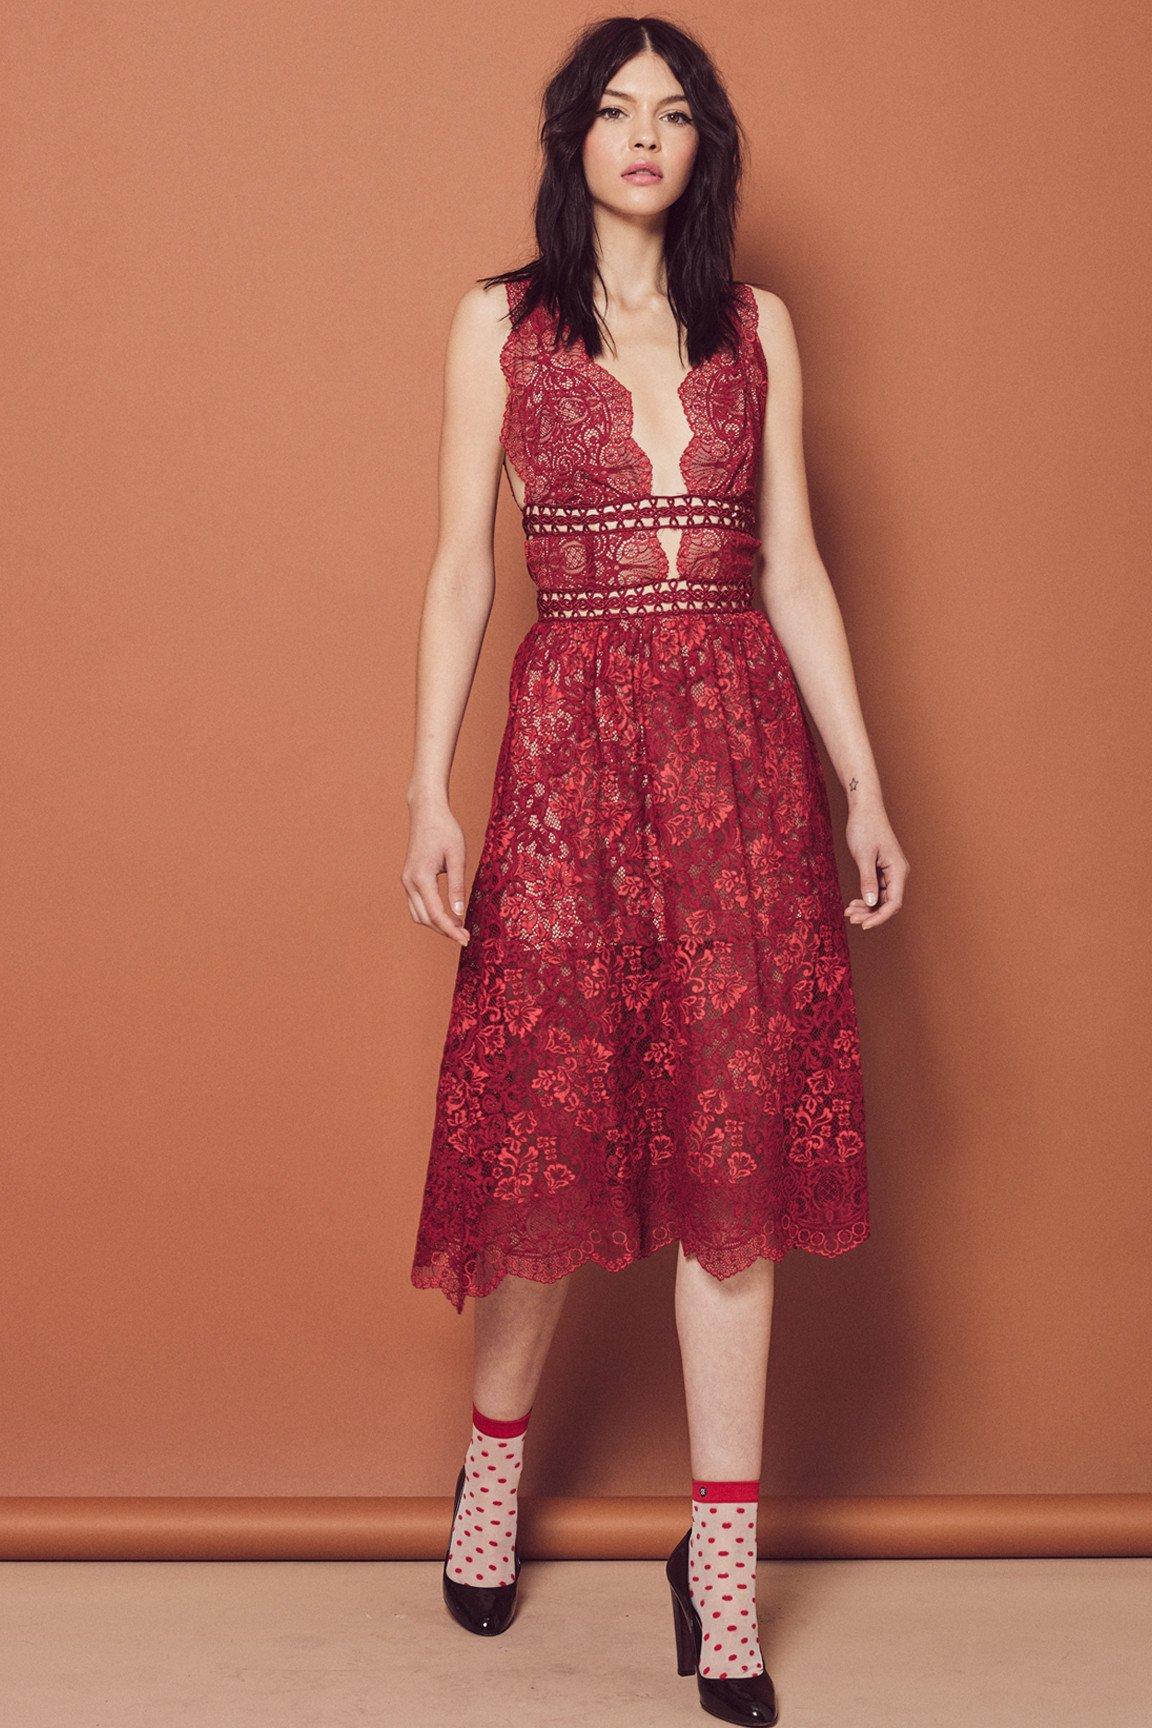 10 Gorgeous Dresses to Wear to a Summer Wedding - FabFitFun